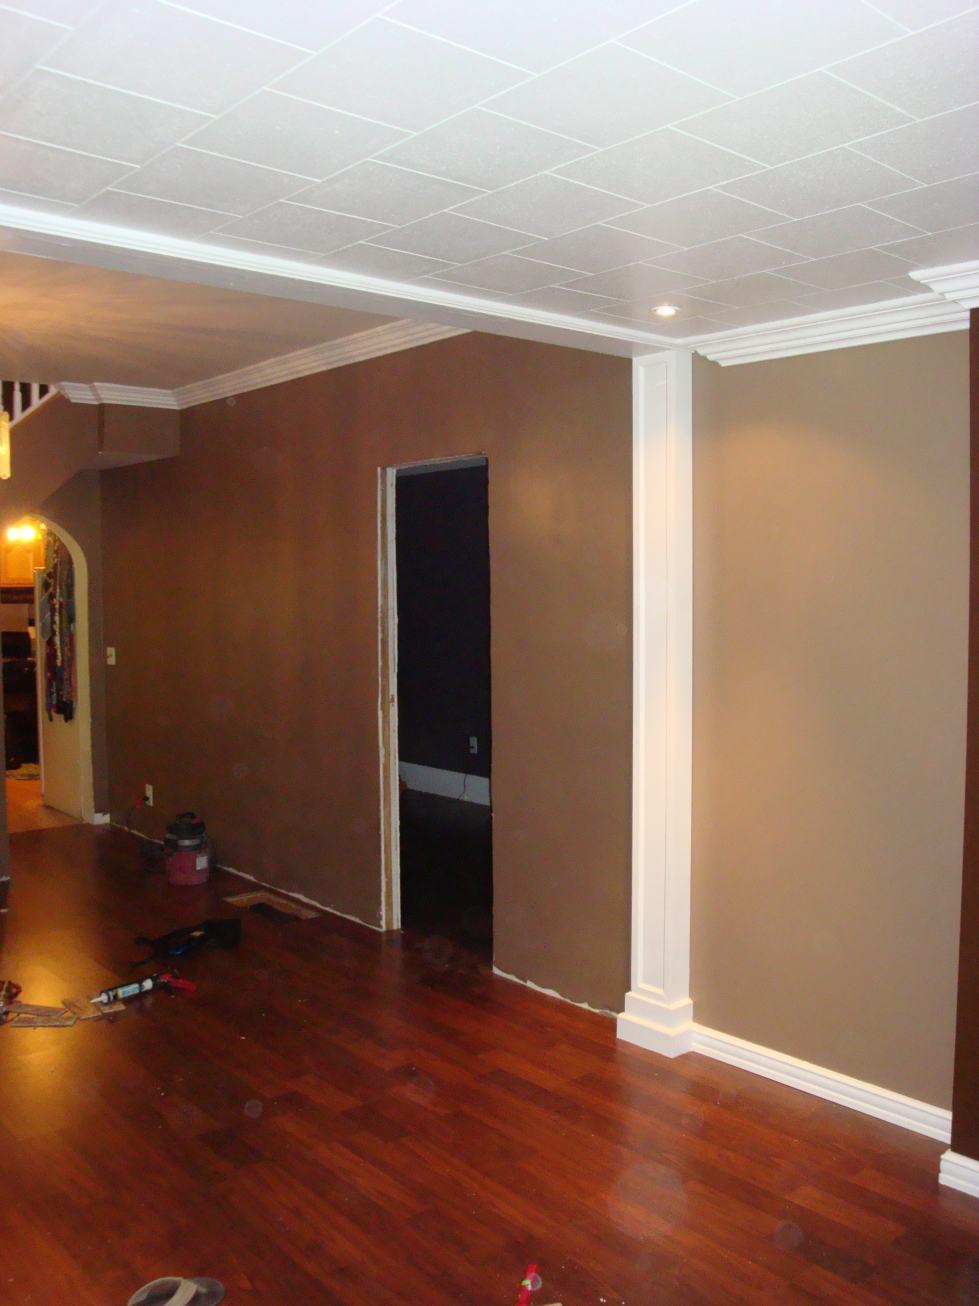 First house remodel-dsc08416.jpg